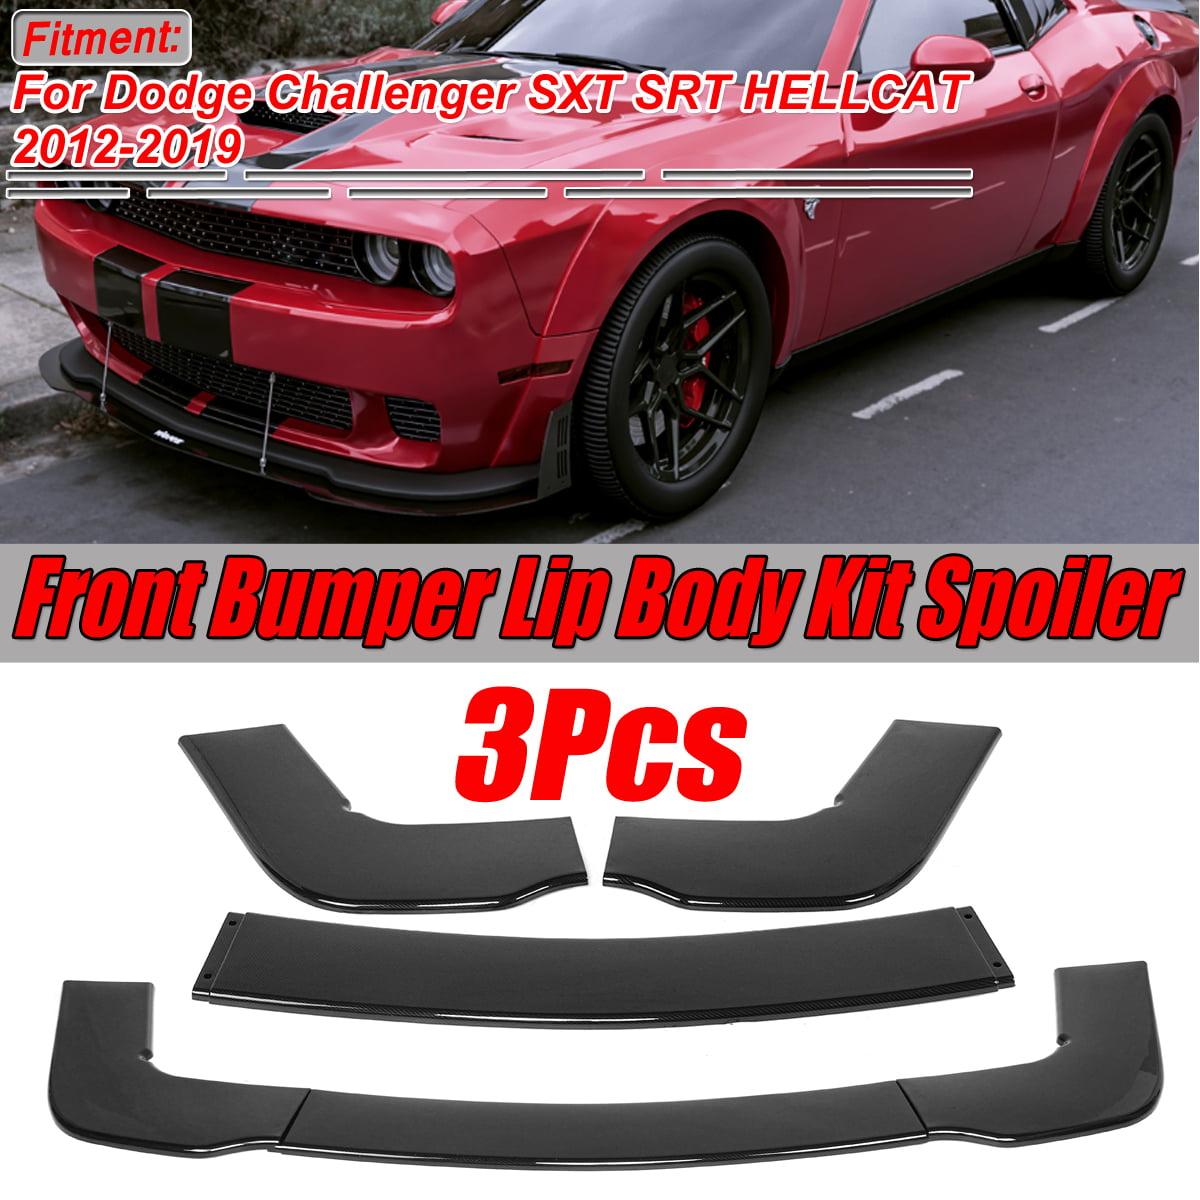 Front Bumper Lip Body Kit Spoiler For Dodge Challenger Sxt Srt Hellcat 2012 2019 With Accessories Screws Attachment Walmart Com Walmart Com